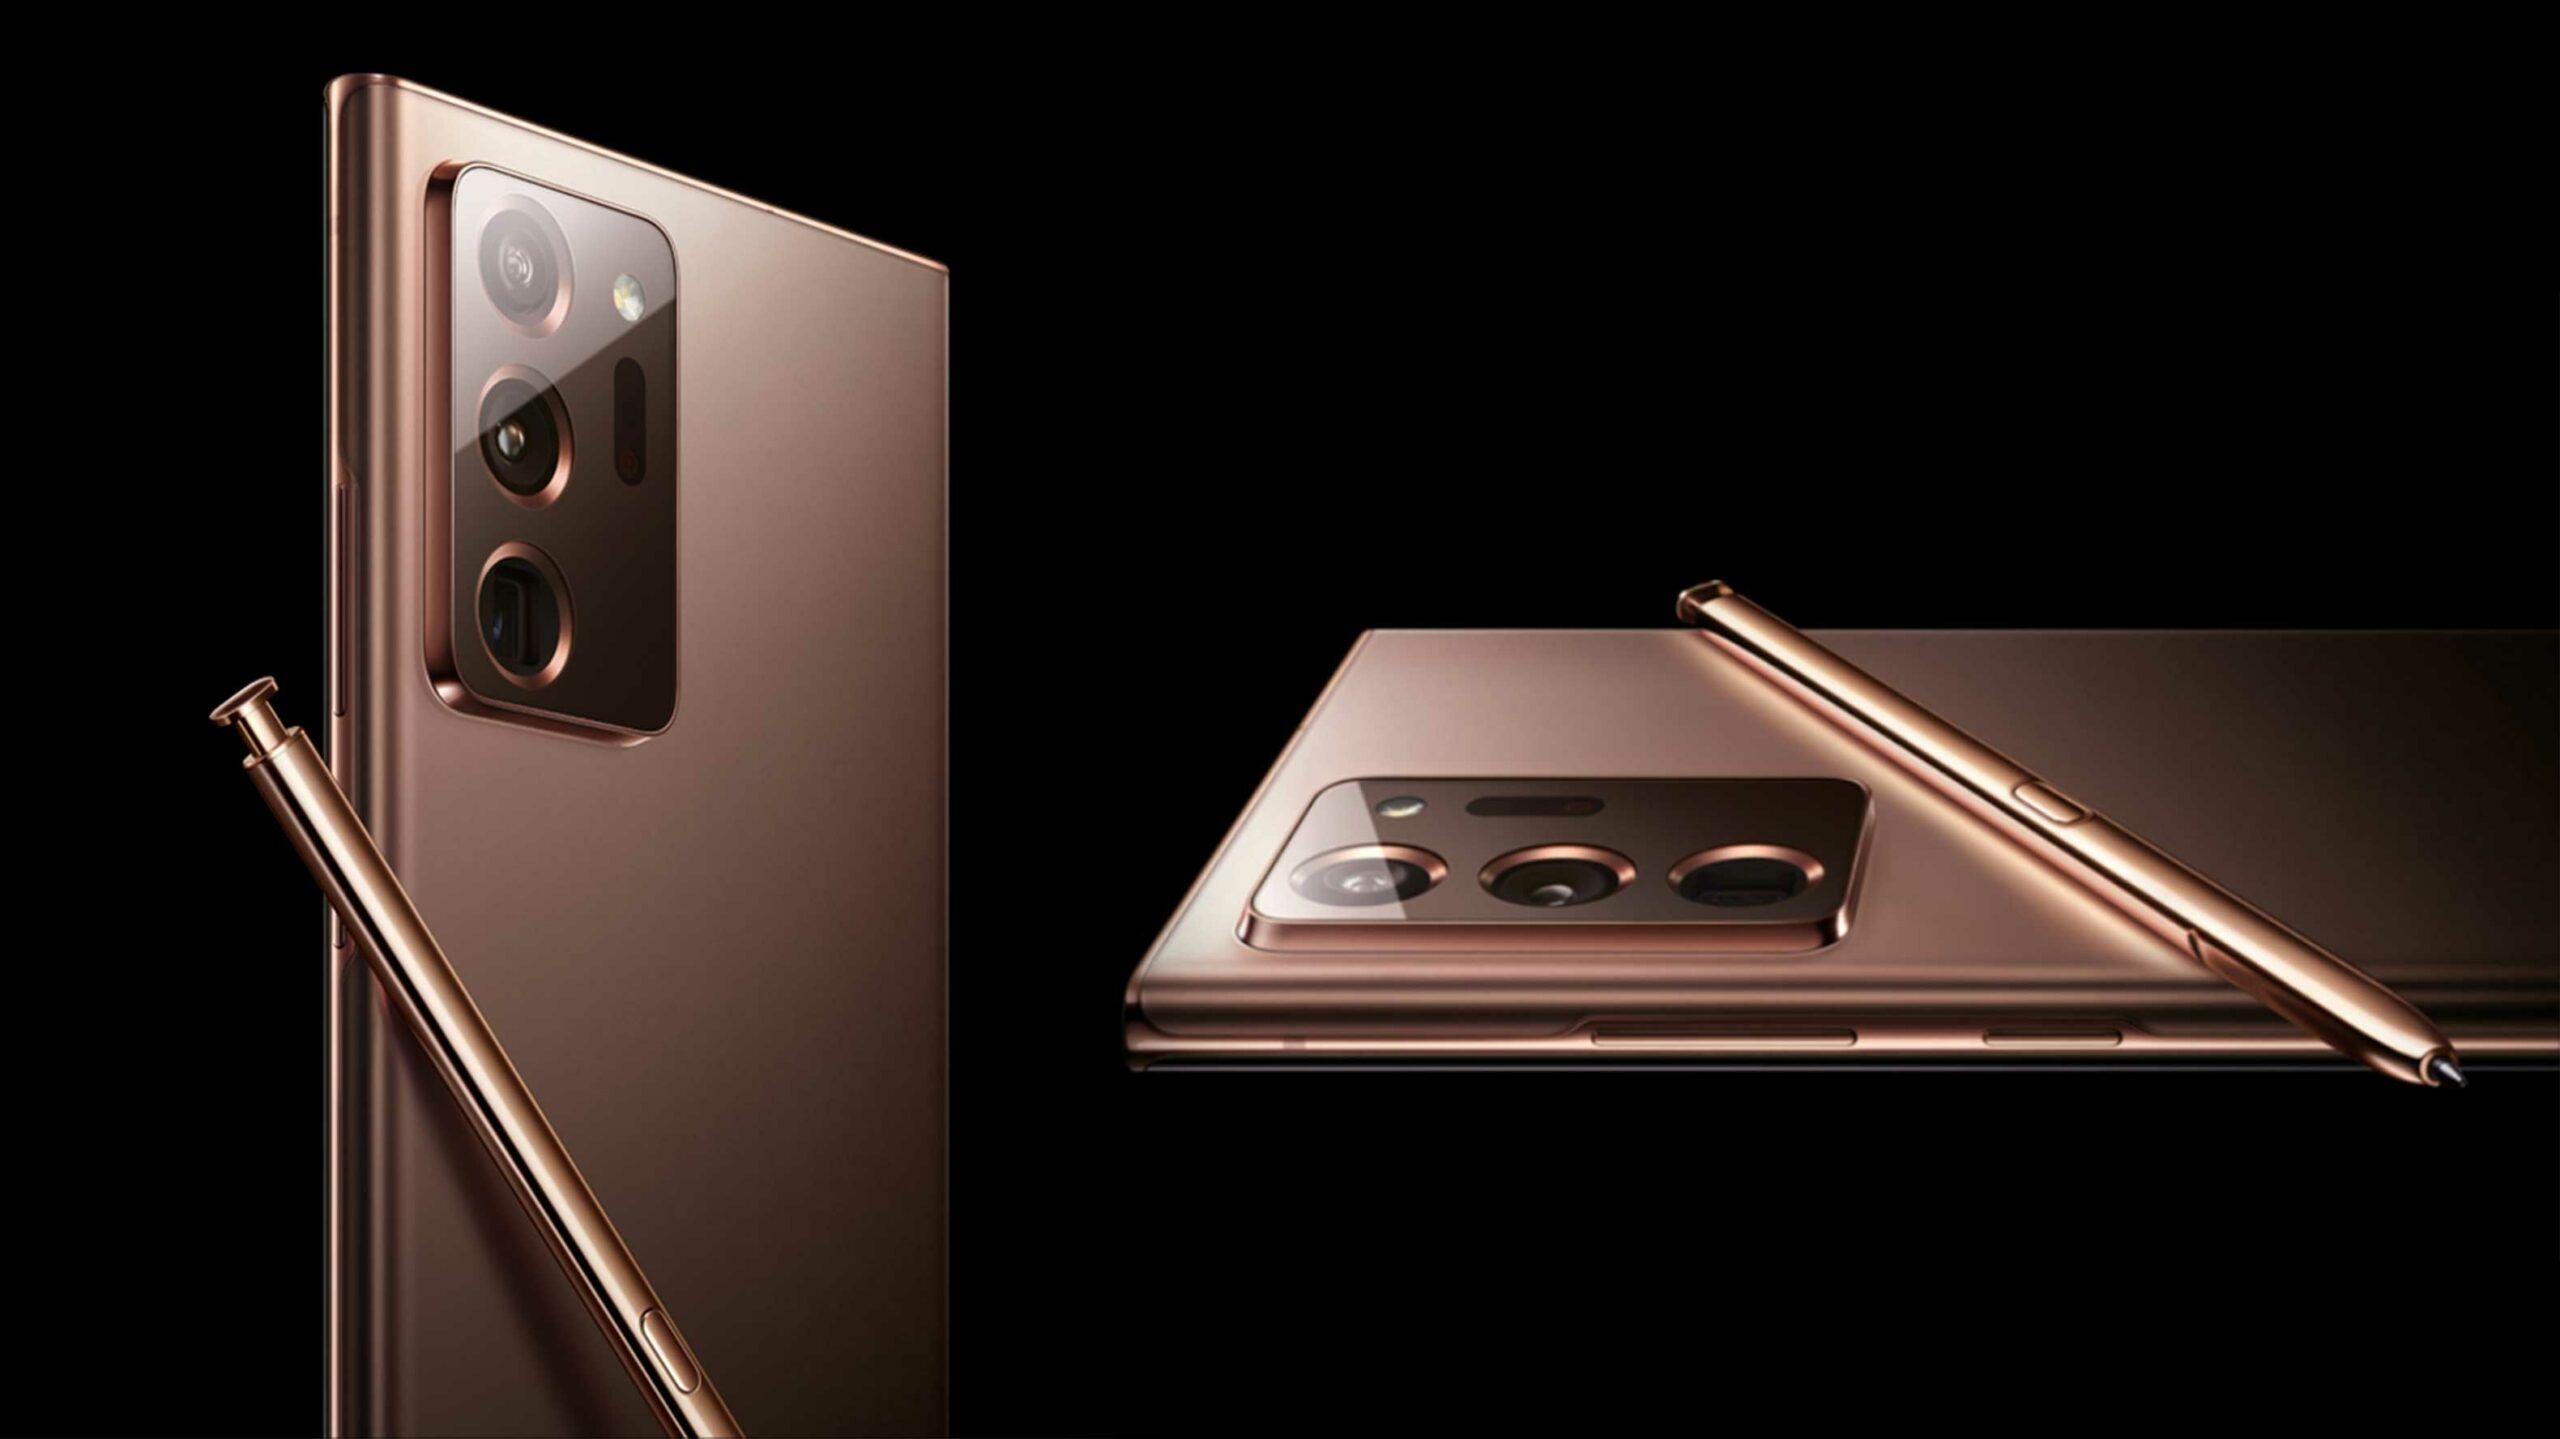 Mystic-bronze-note-20-ultra-leak-1-scaled.jpg